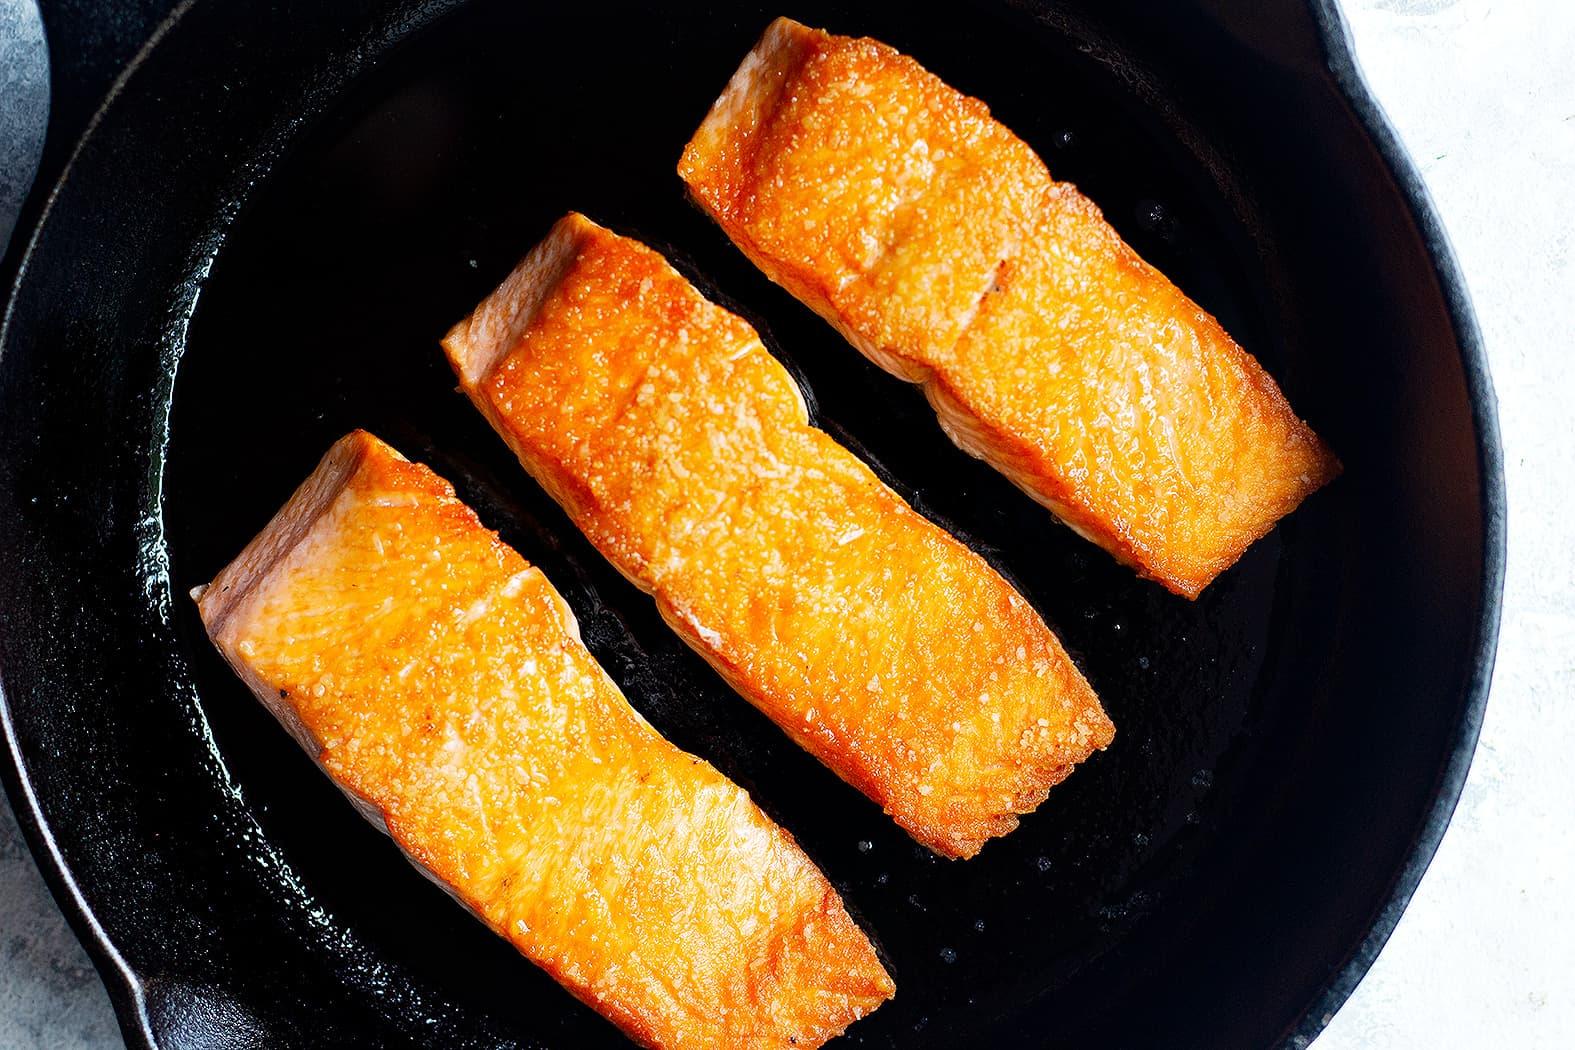 crispy salmon fillets in a pan to make orange glazed salmon recipe.